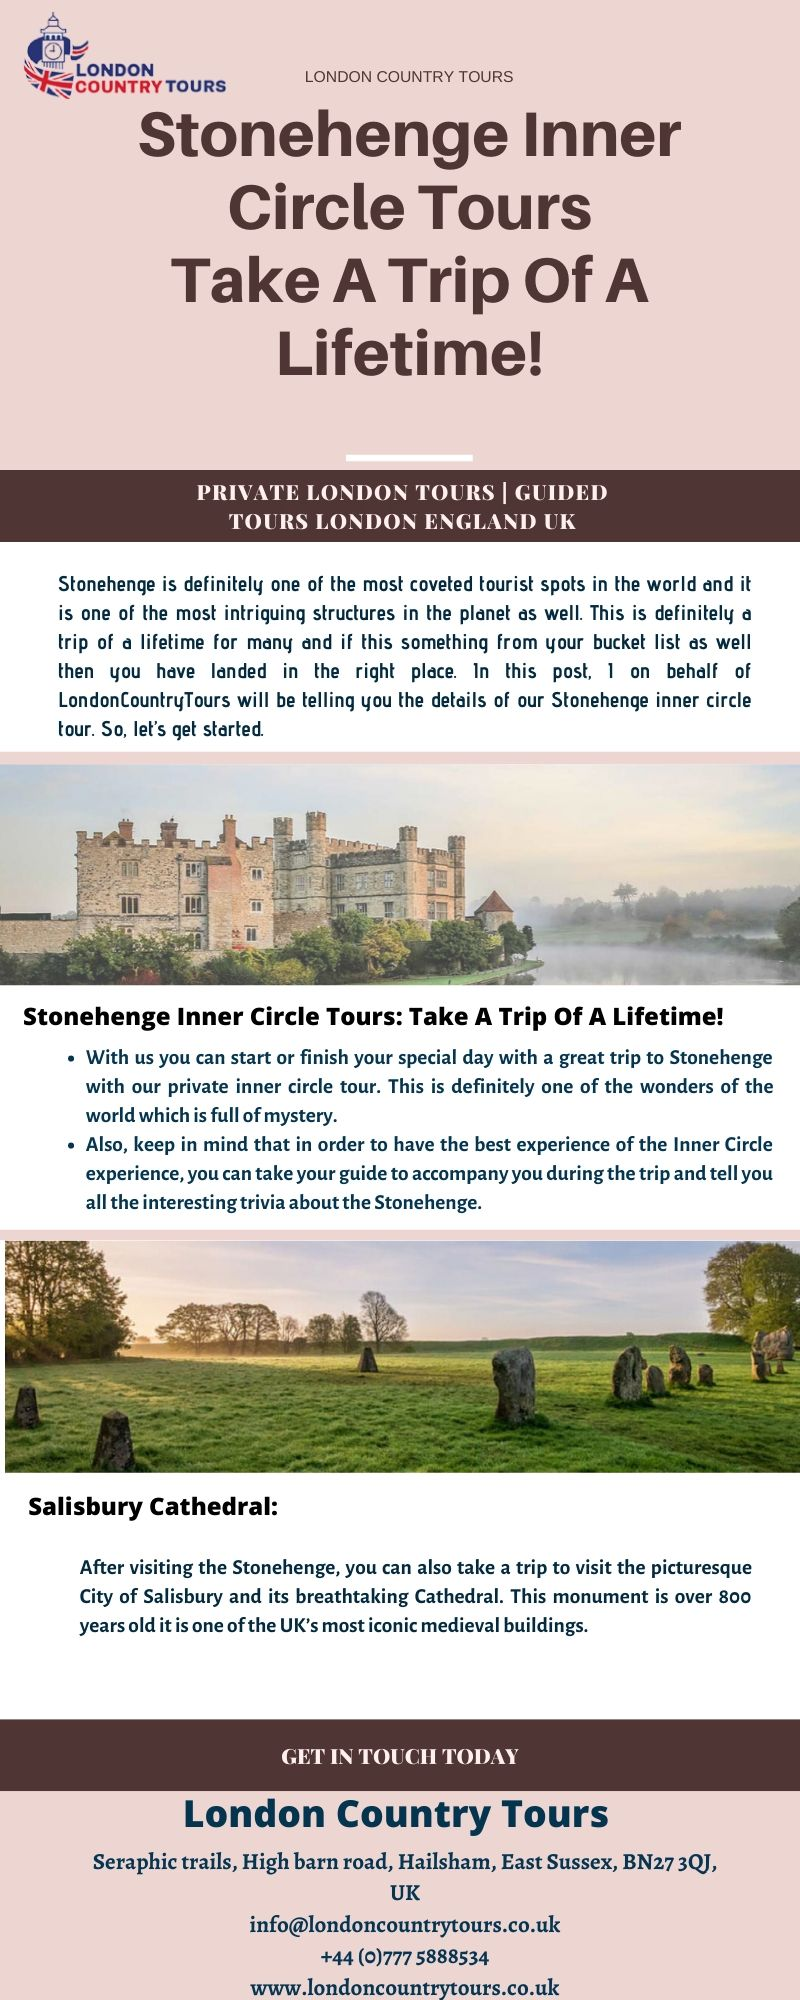 Stonehenge Inner Circle Tours_ Take A Trip Of A Lifetime!.jpg  by LondonCountryTours